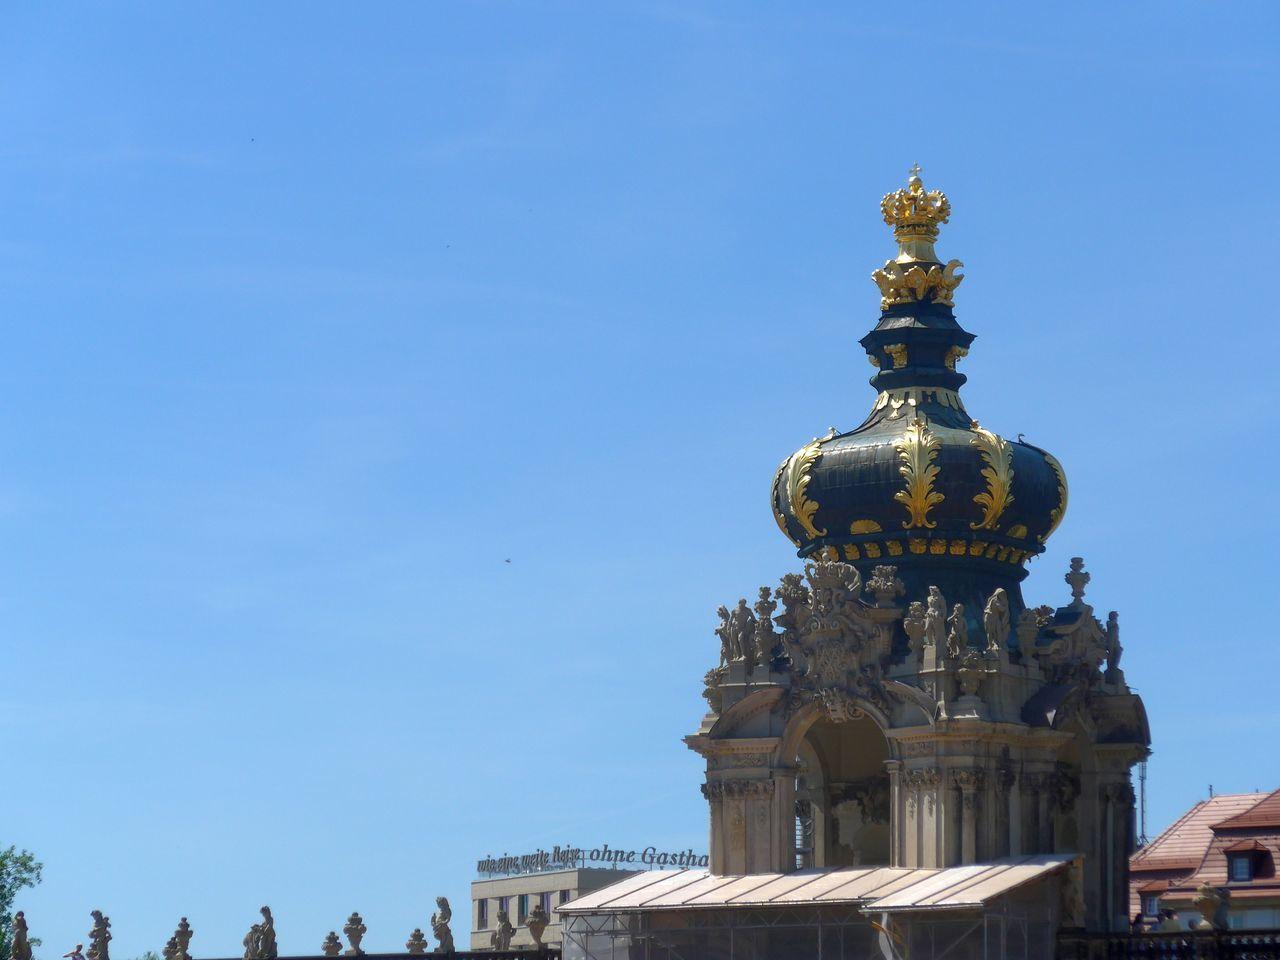 Architecture Barock Baroque Architecture Blue Sky Travel Destinations Zwinger Dresden Spire  Tower Splendor Baroque Splendor Your Ticket To Europe